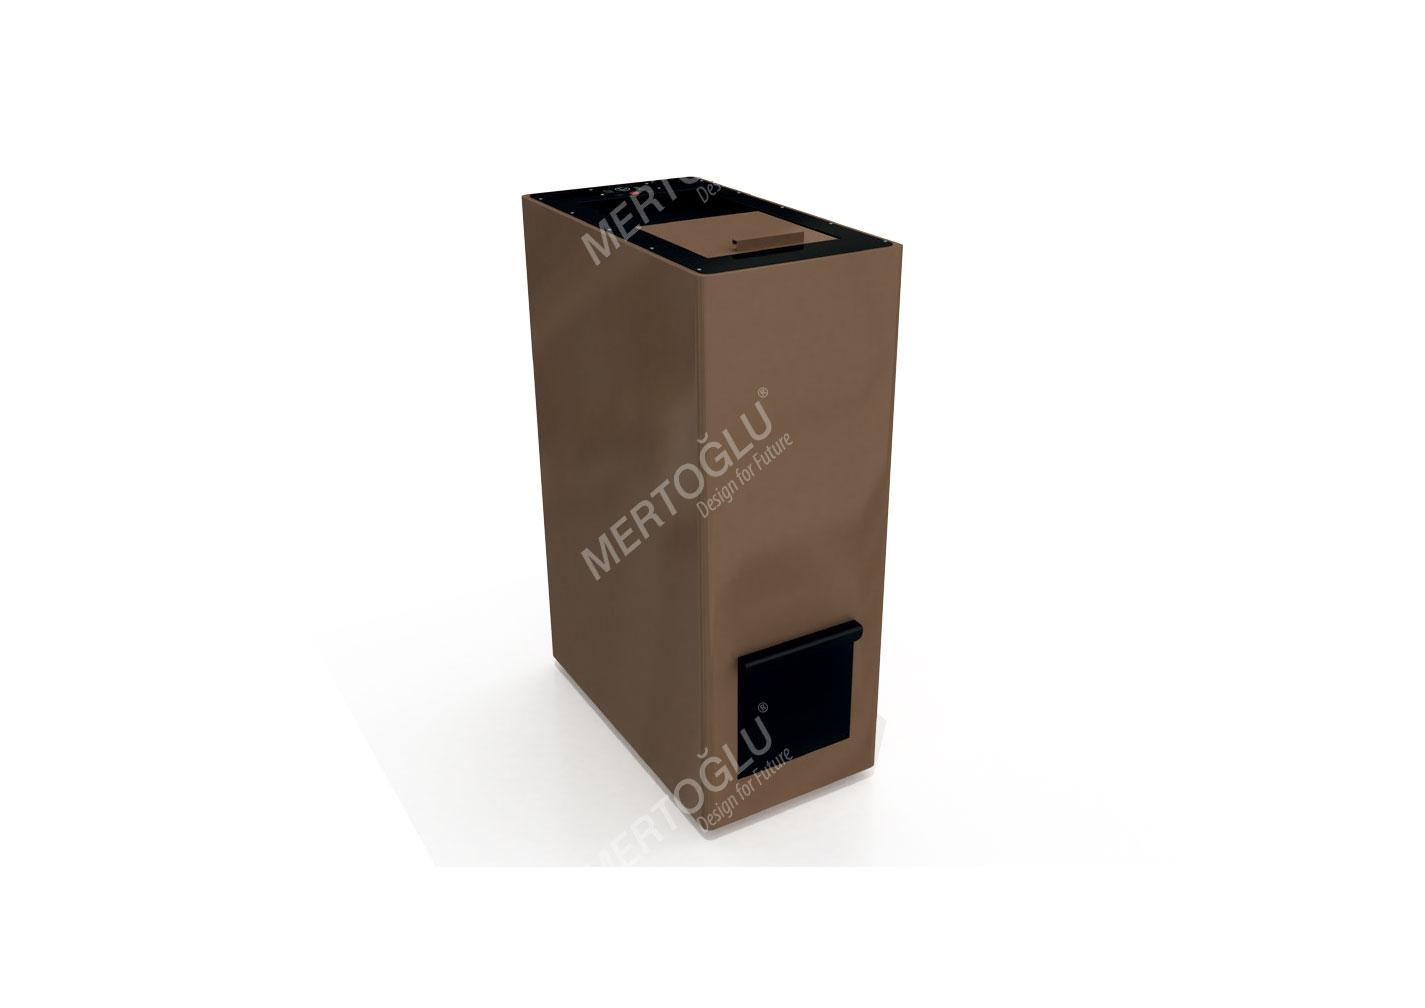 Sıfır Kayıp Projesi Ev Tipi Kompost Makinası Msa-103b